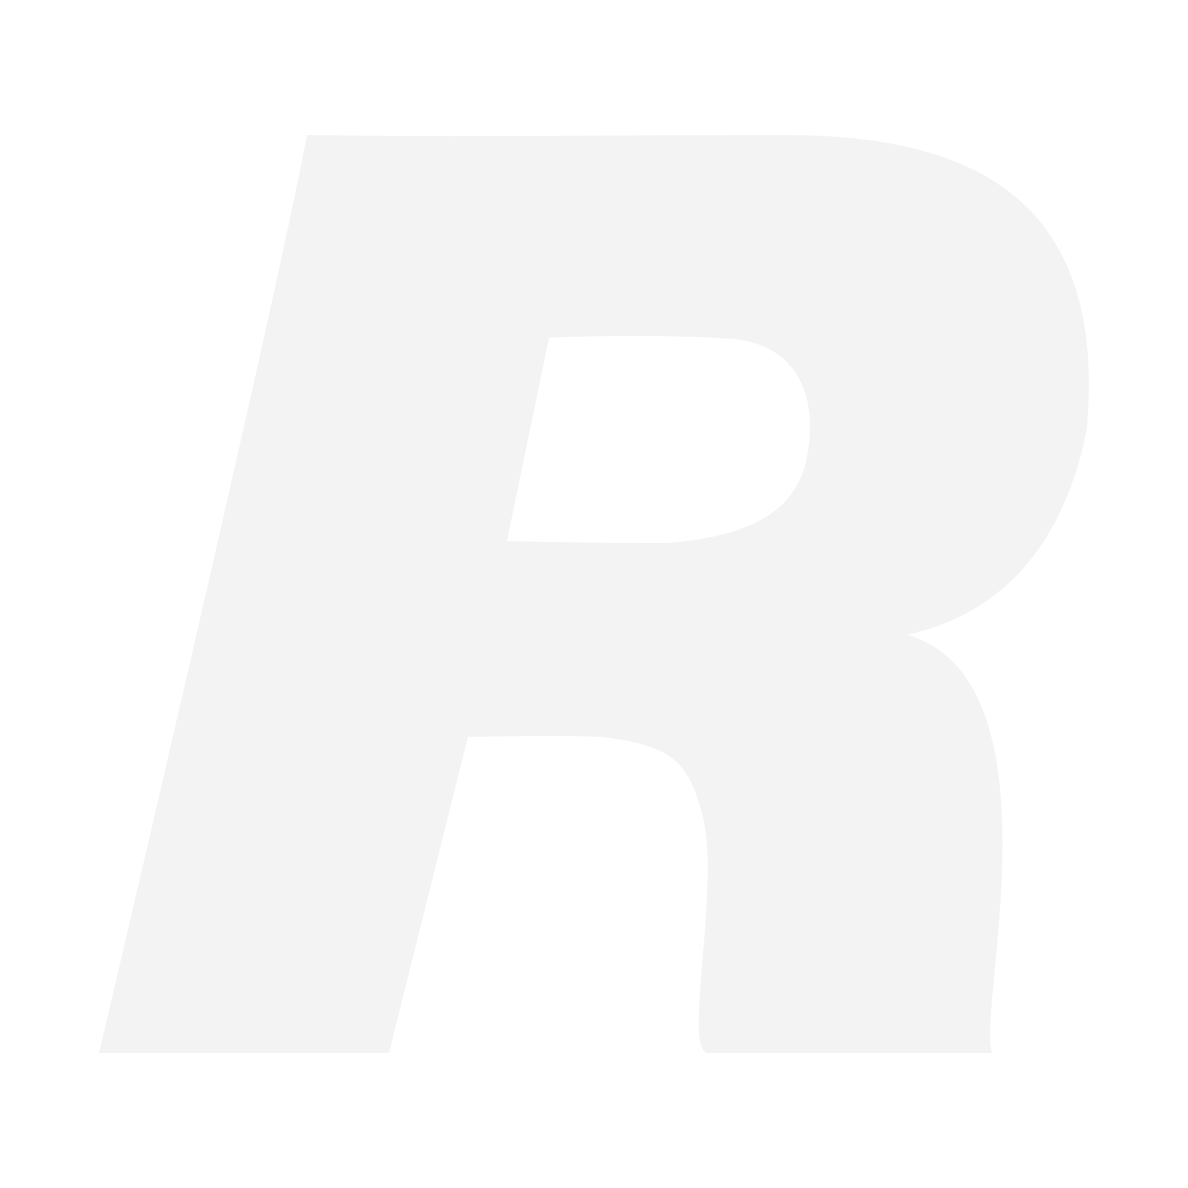 RYCOTE BLACK RISTLETTO LAVAL. WINDJAMMER